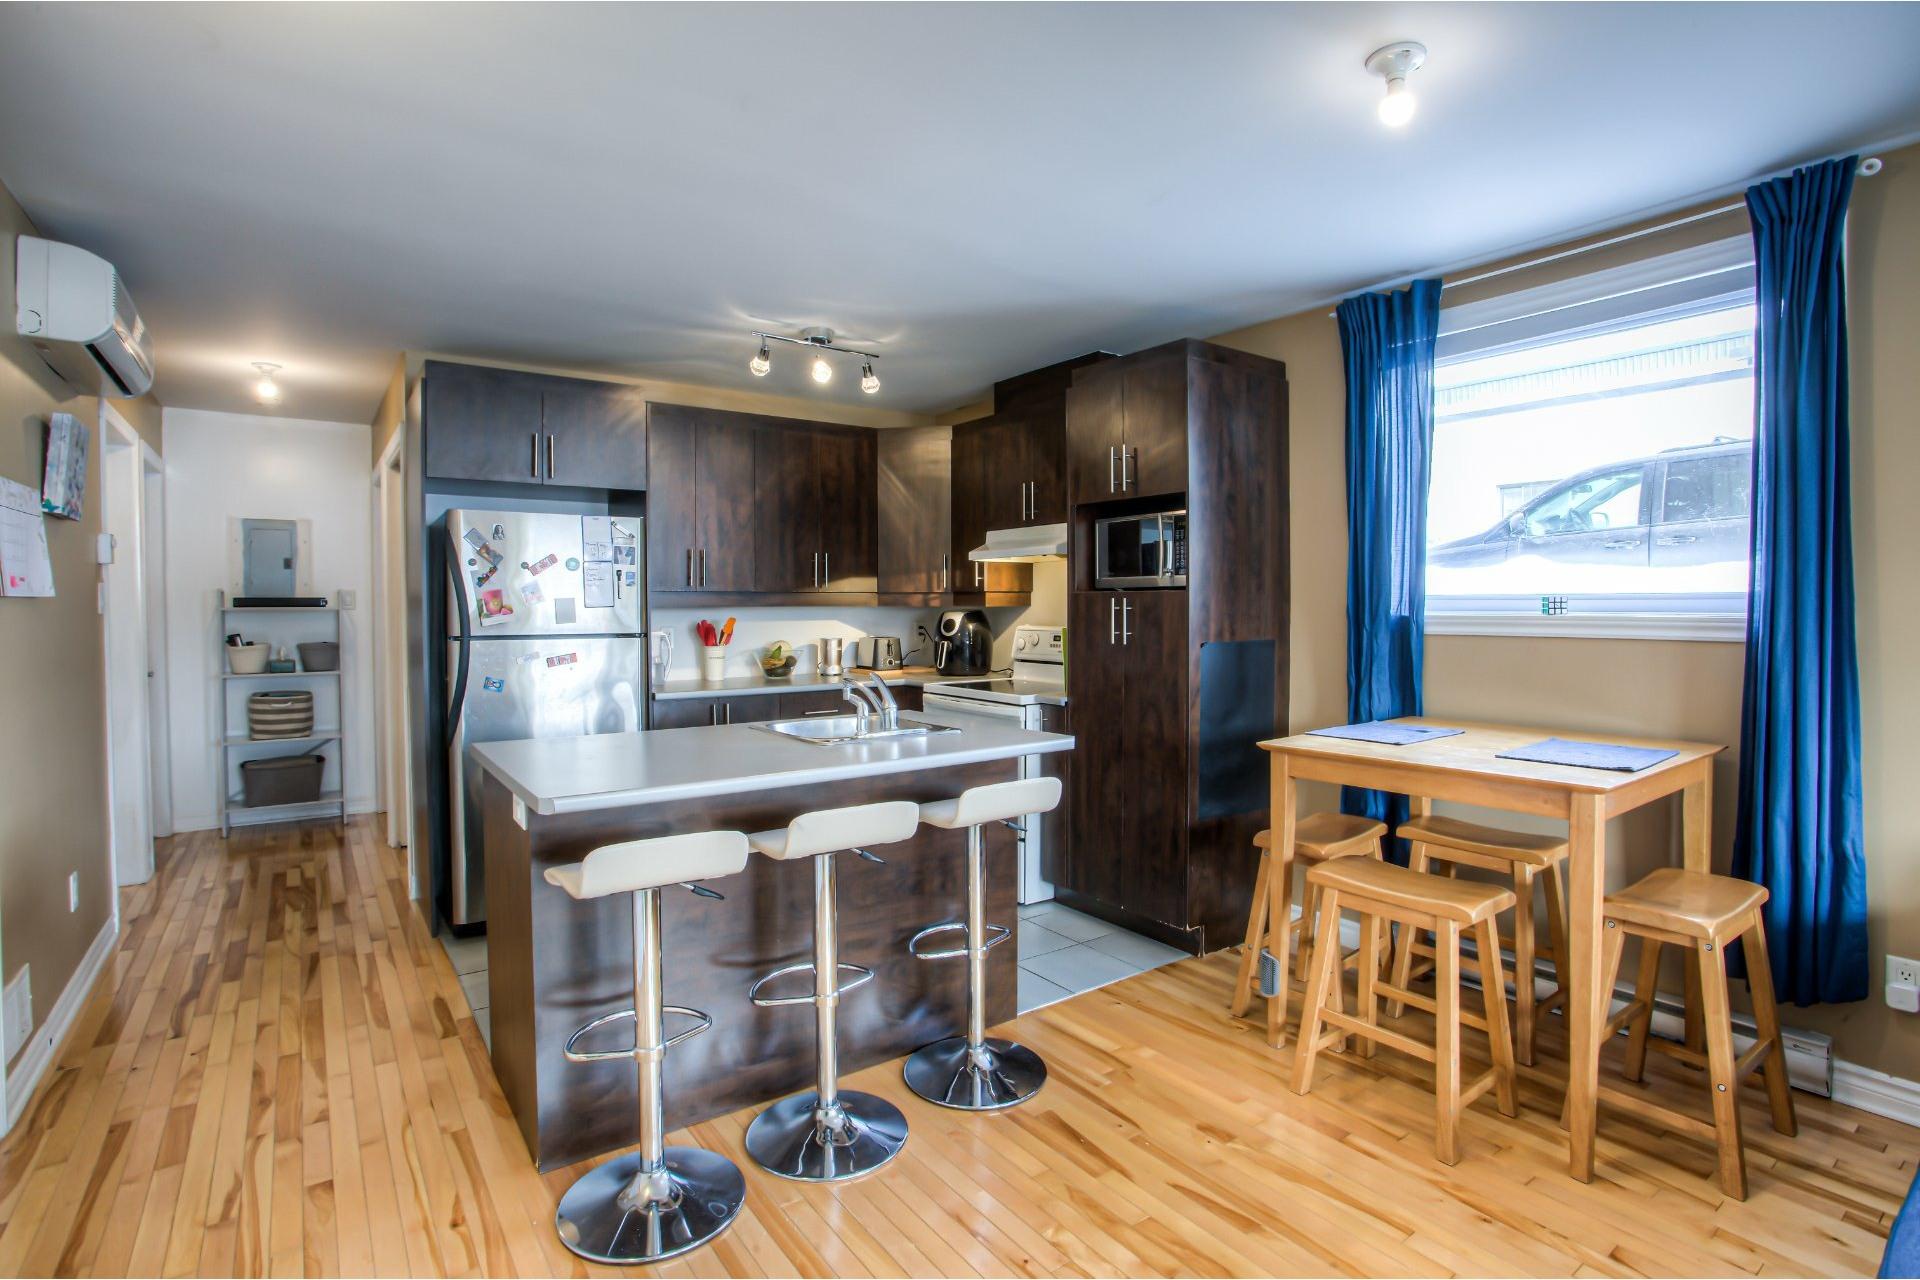 image 10 - Departamento Para alquiler Villeray/Saint-Michel/Parc-Extension Montréal  - 5 habitaciones